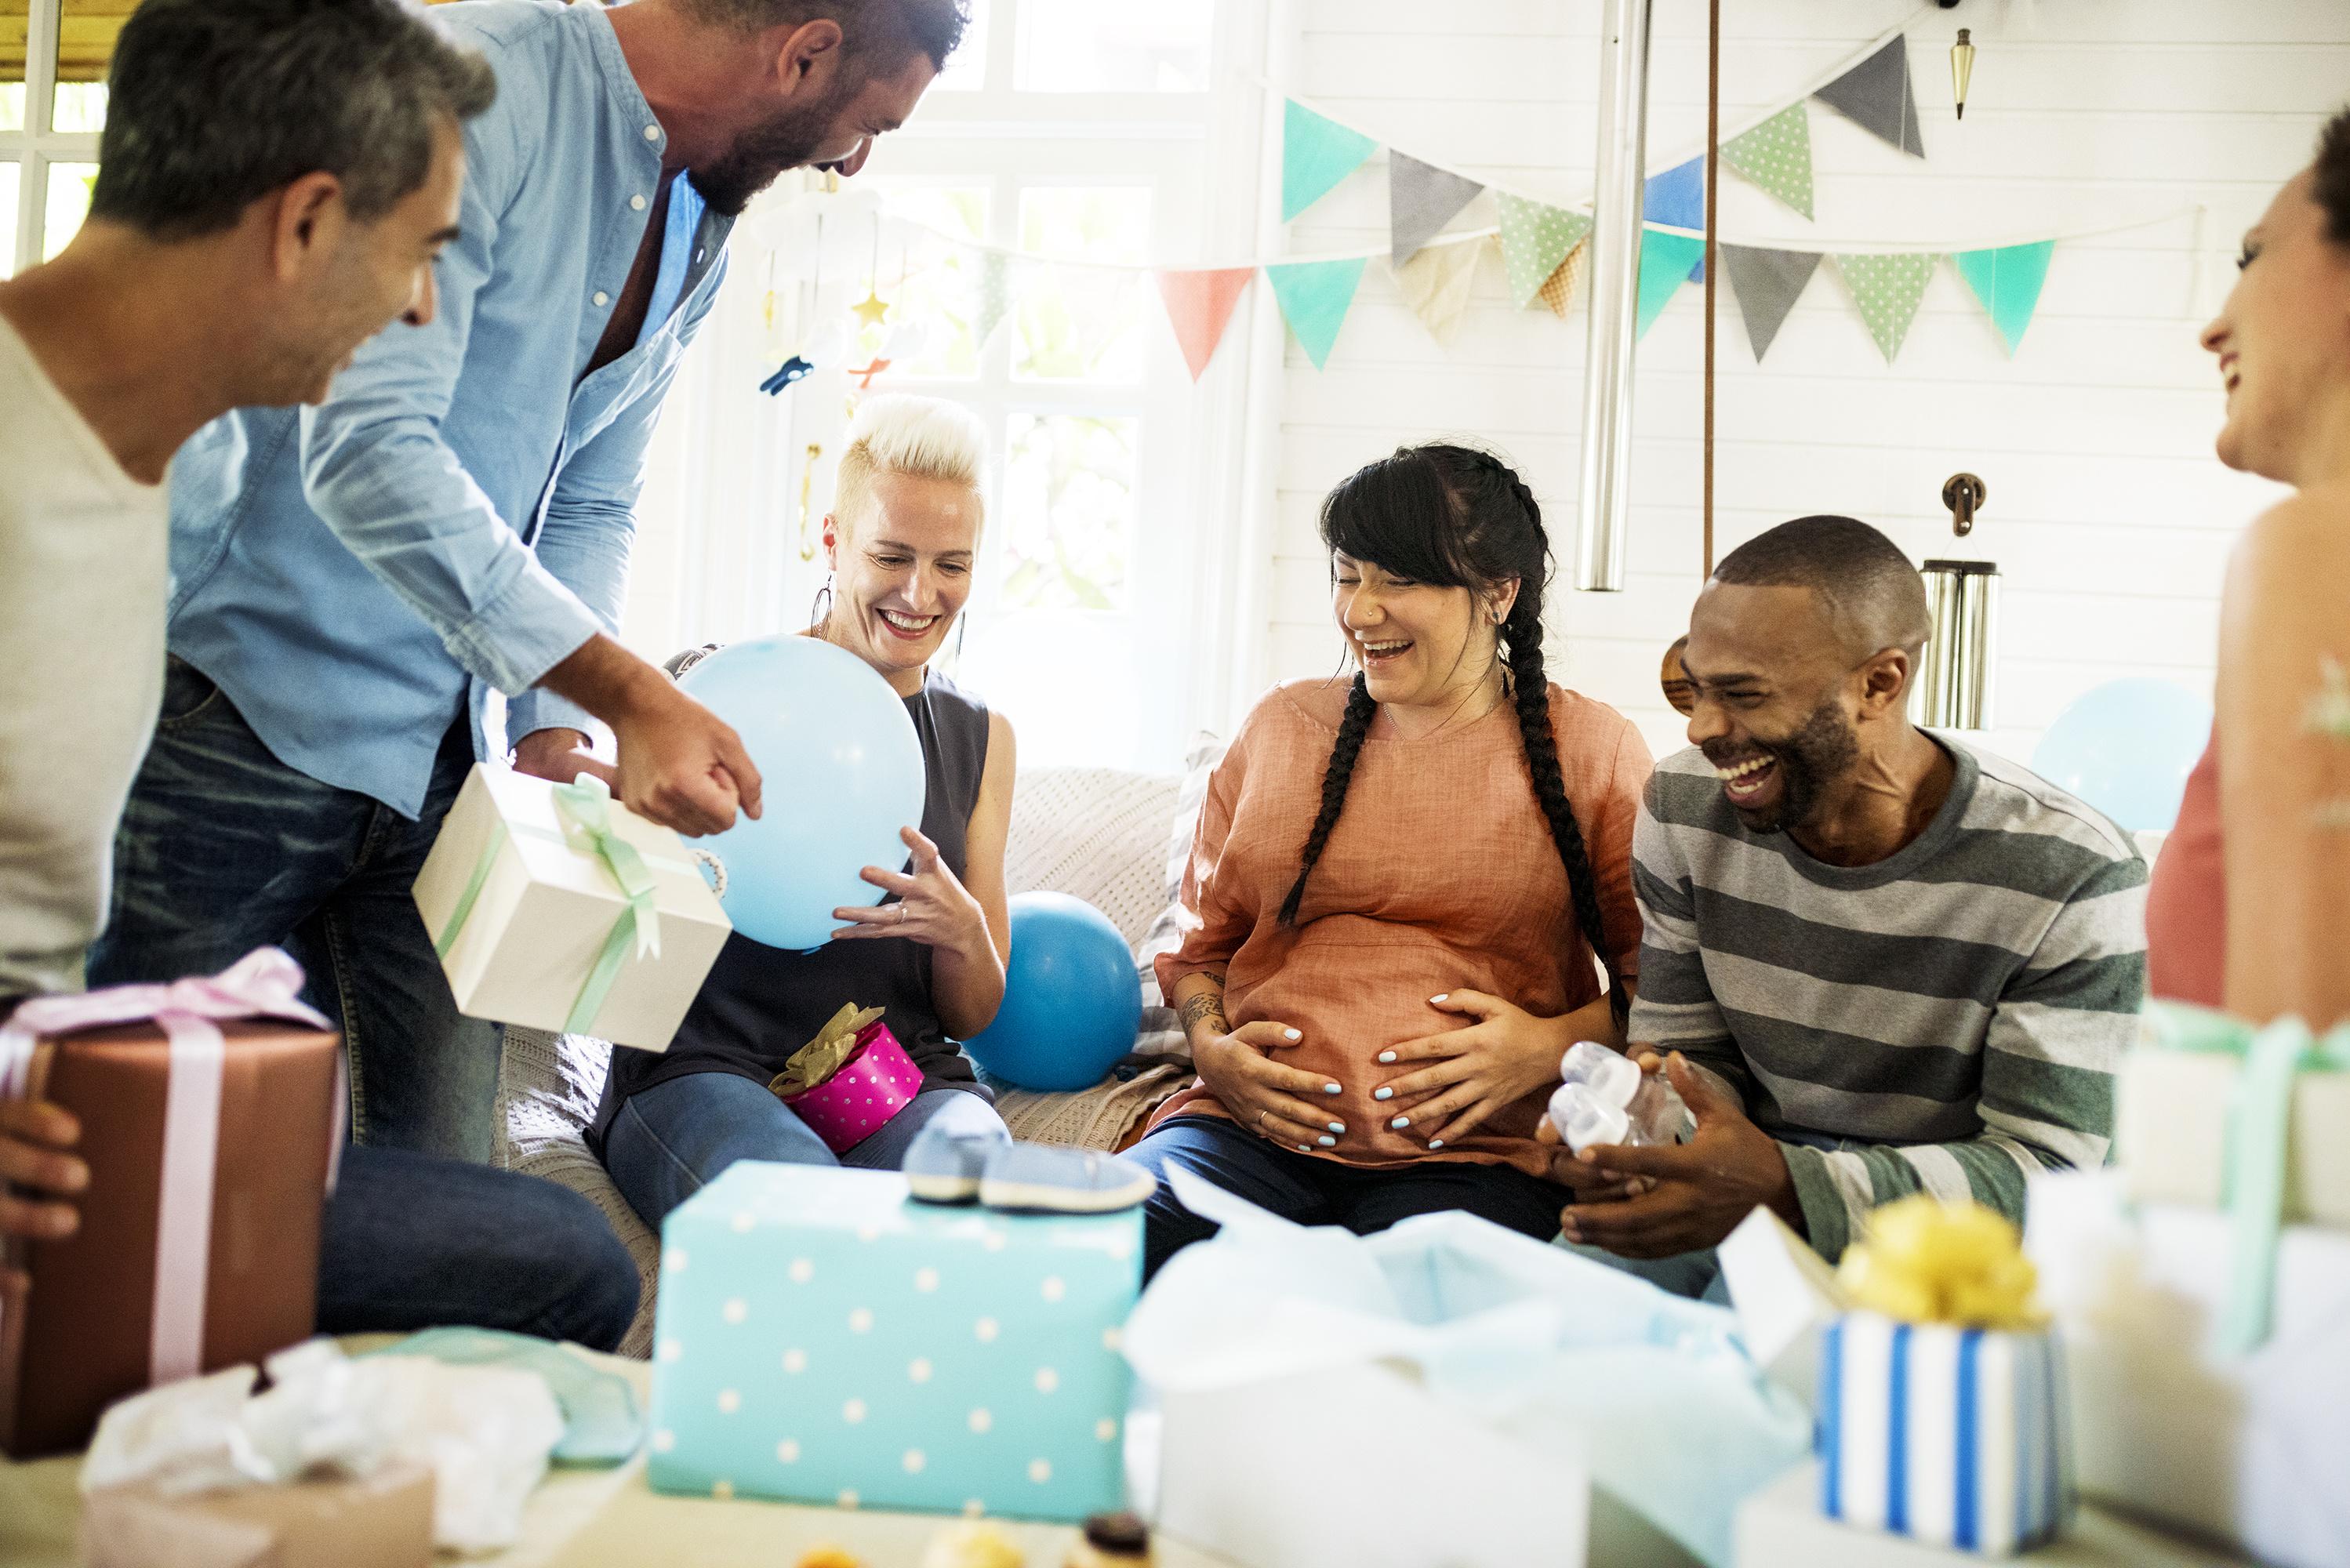 10 Baby Shower Trends for 2019 - EVENTup Blog